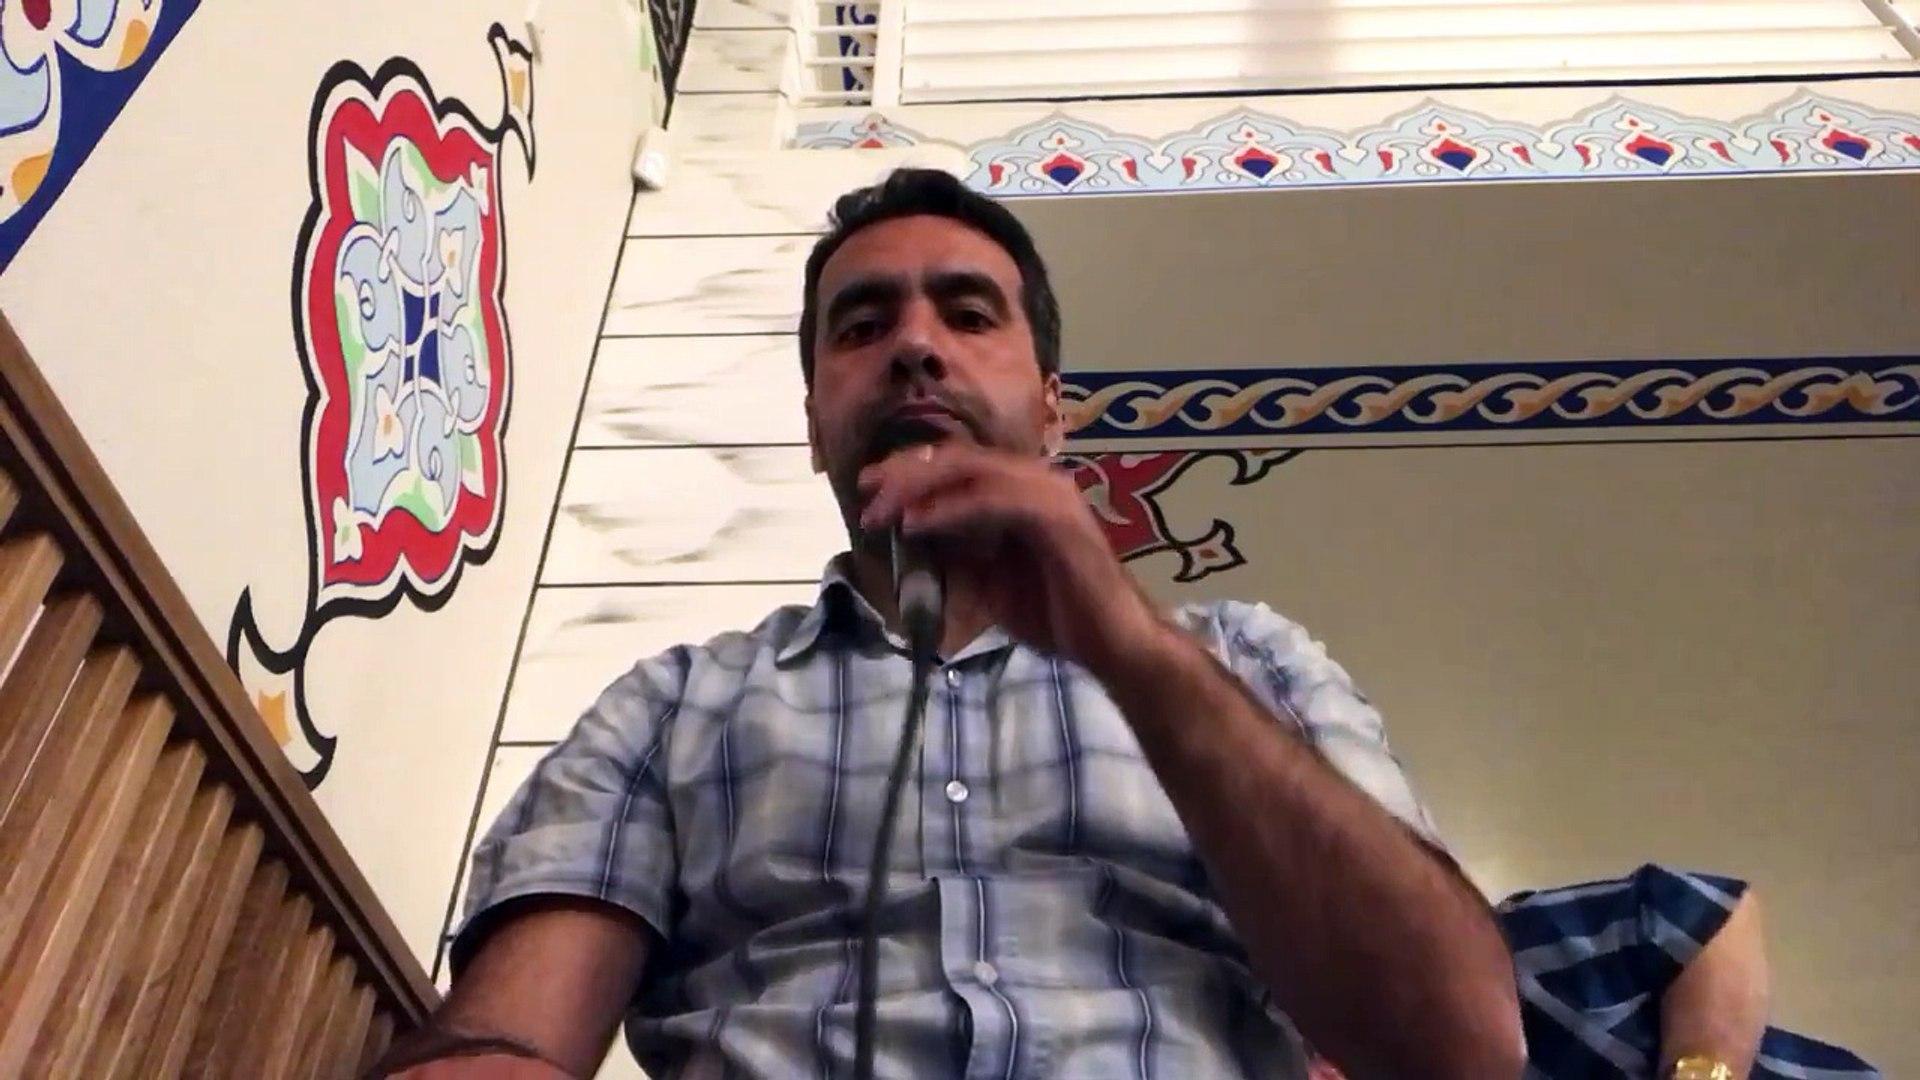 MÜTHIS Arap makam Kuran tilaveti. Hafiz Metin Demirtas. MISIR ARAP MAKAMI AMENERRASULU. KIRAAT SÜPER